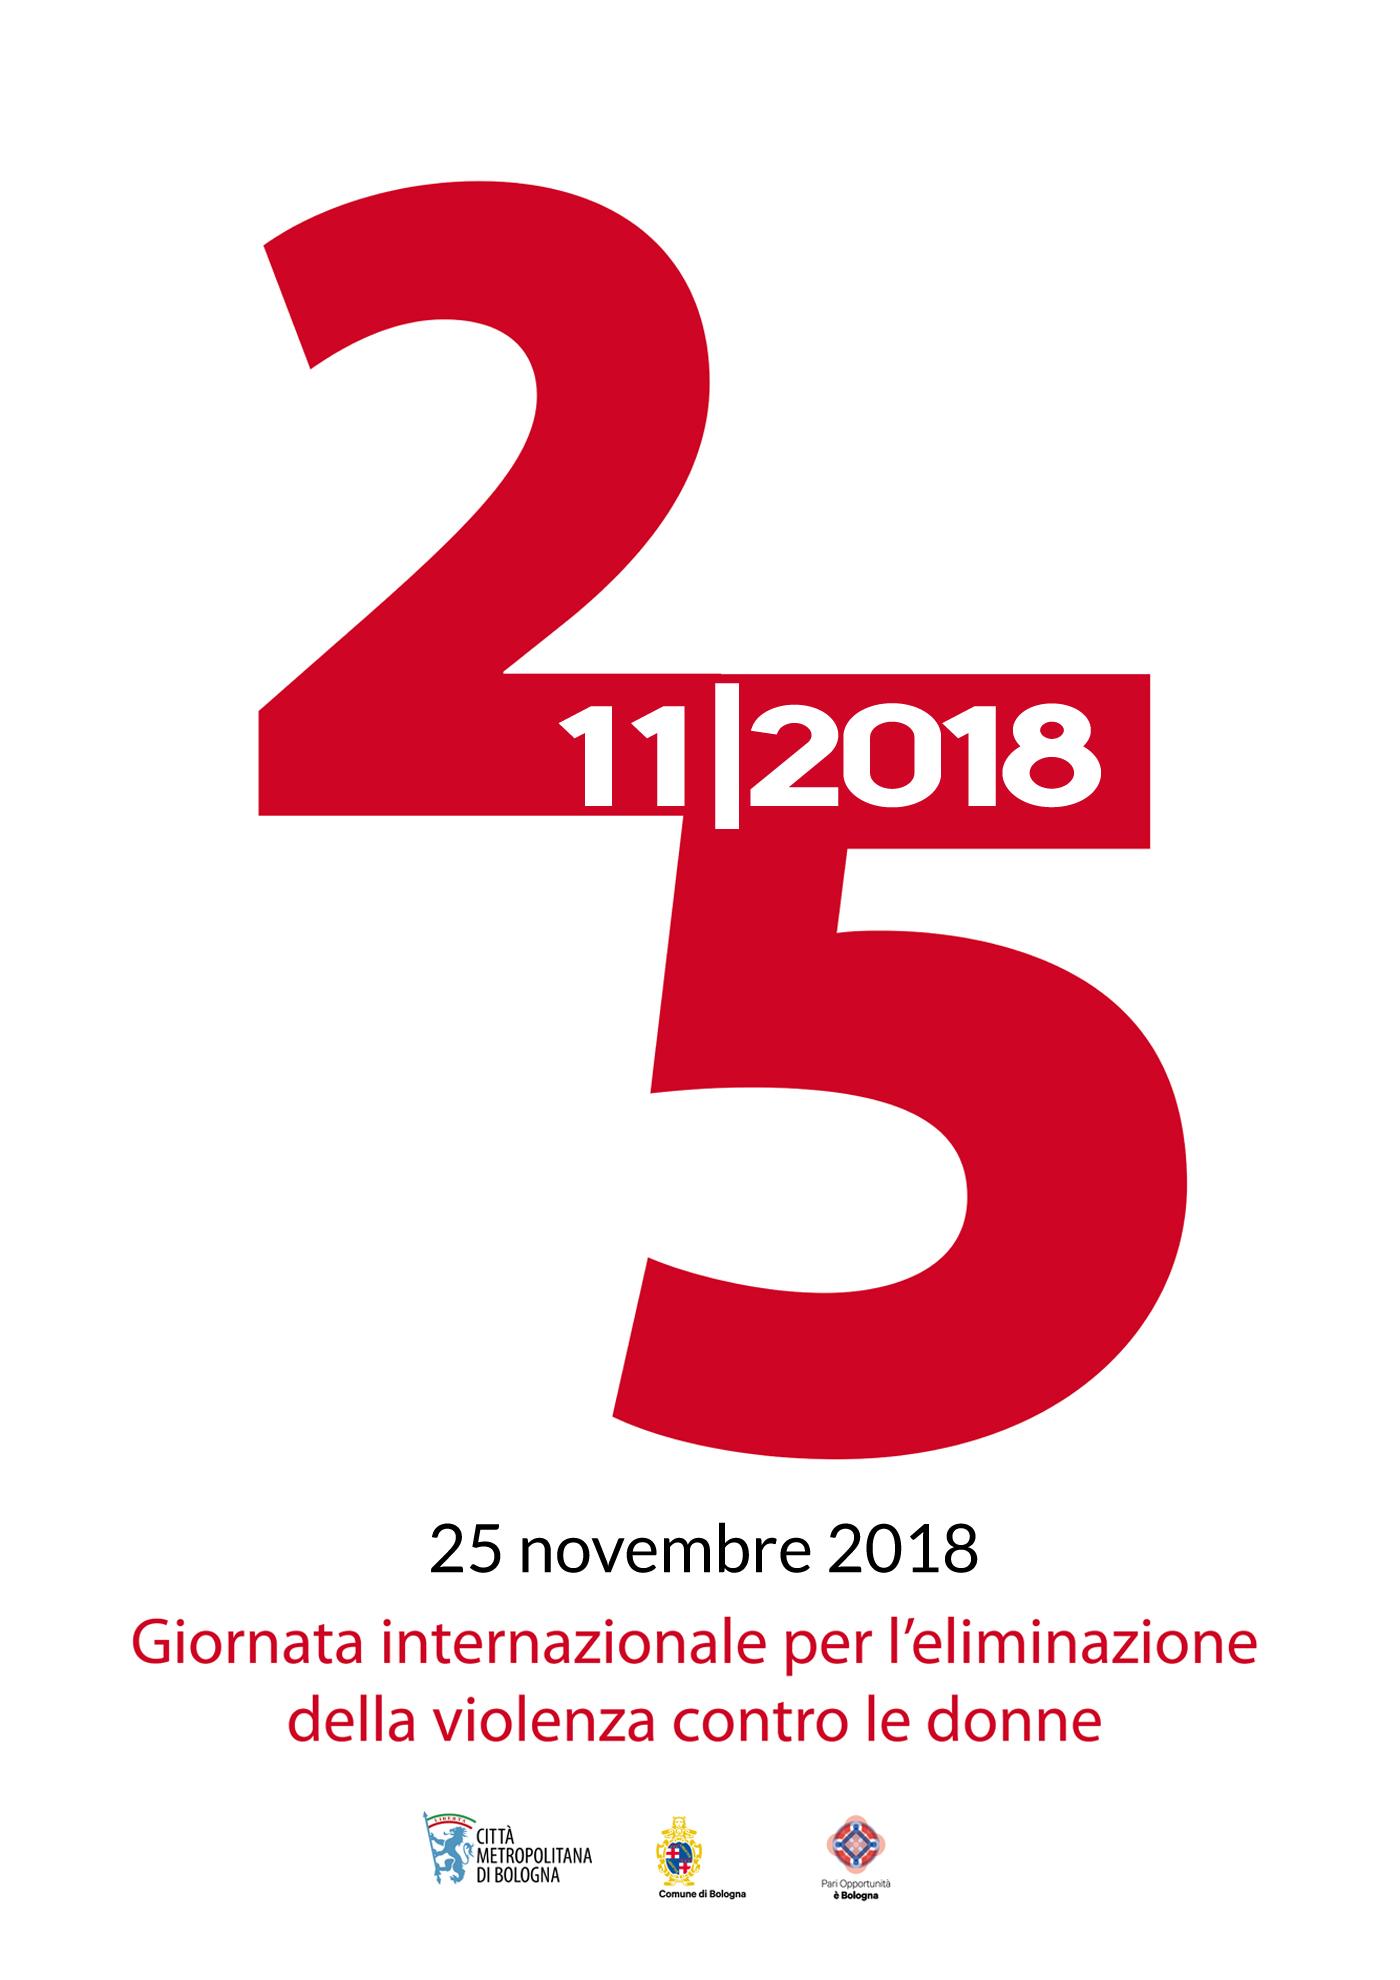 25 novembre 2018